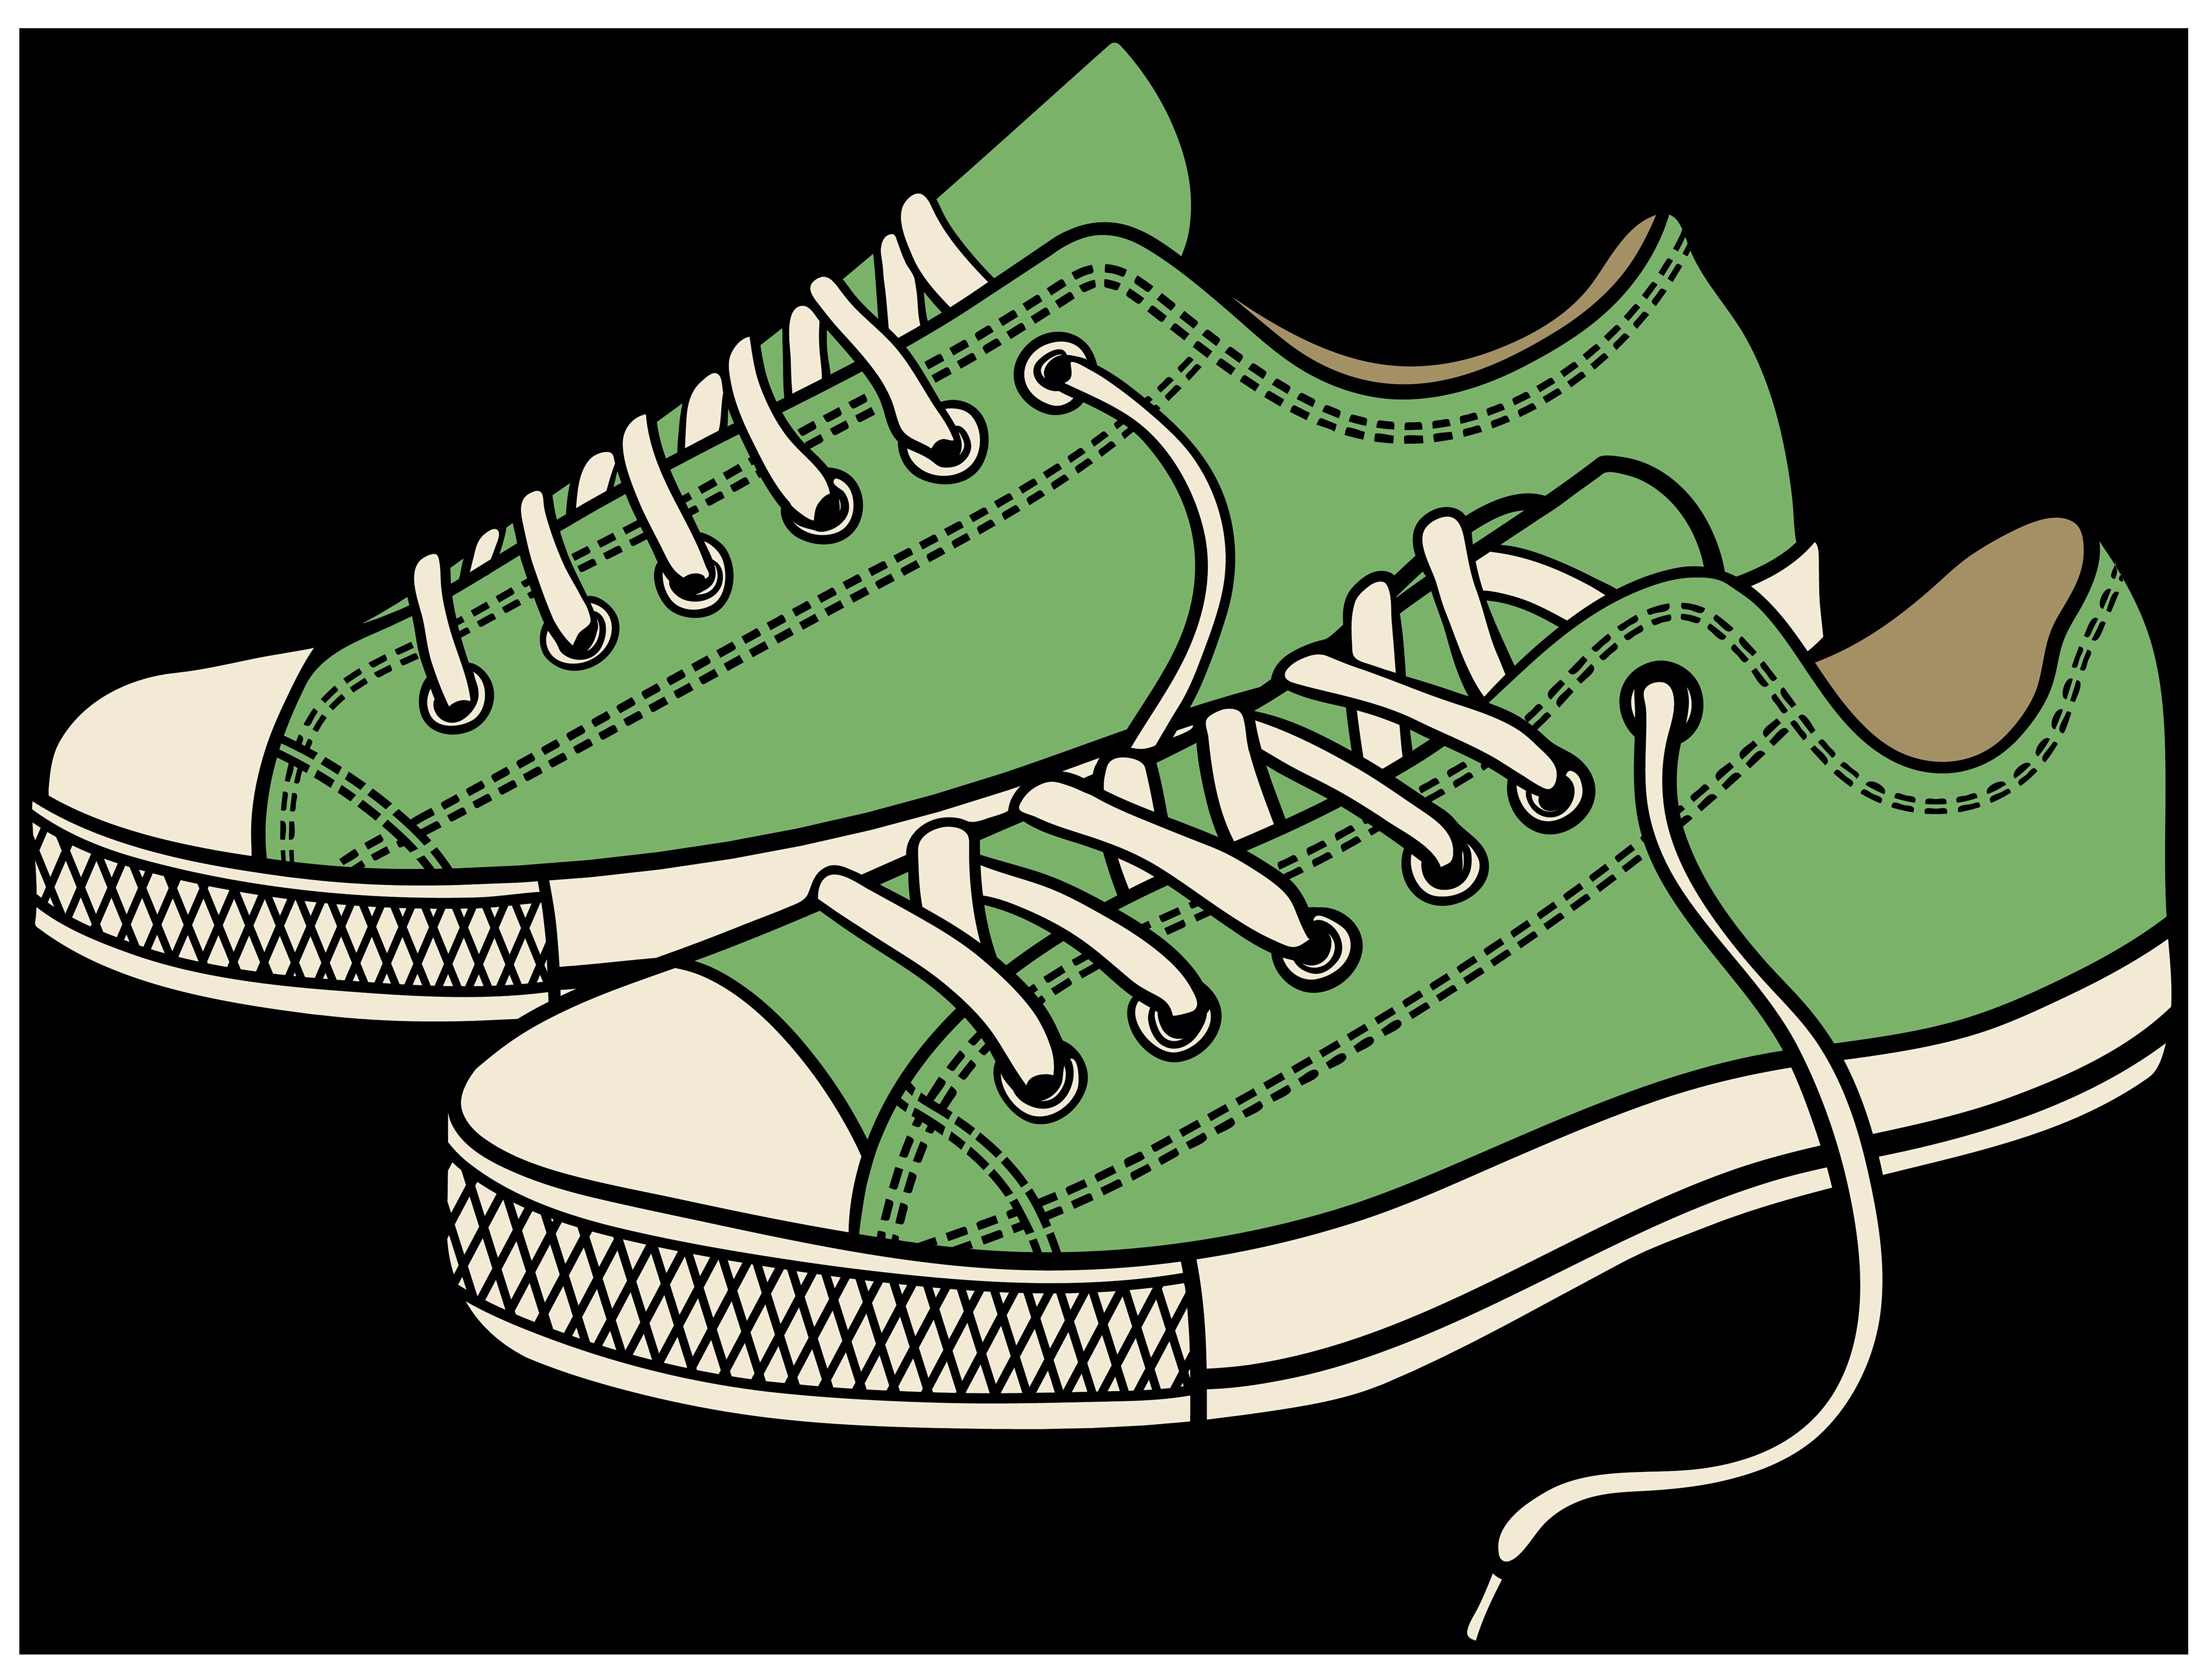 Sneakers clipart Sneakers clipart clipart #17 Download